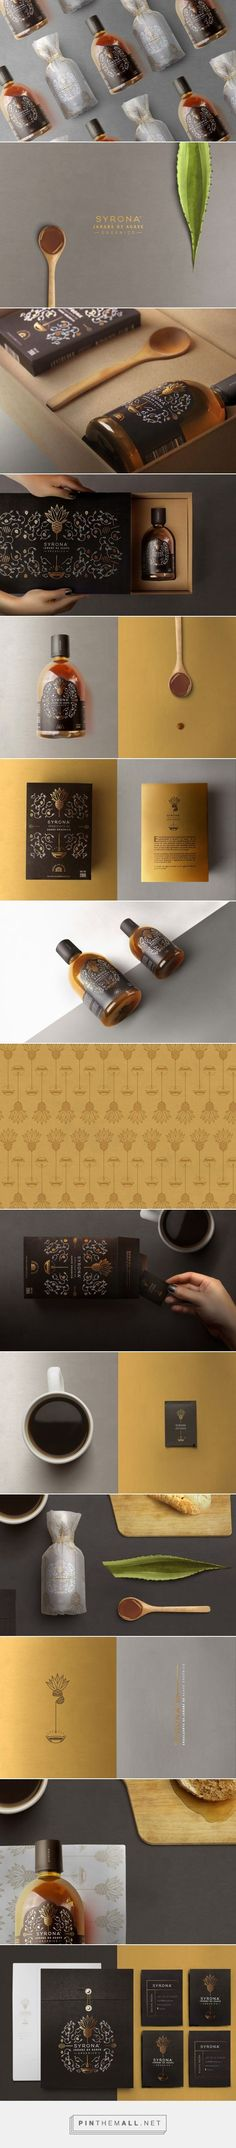 Syrona Packaging by TORO PINTO | Fivestar Branding – Design and Branding Agency…